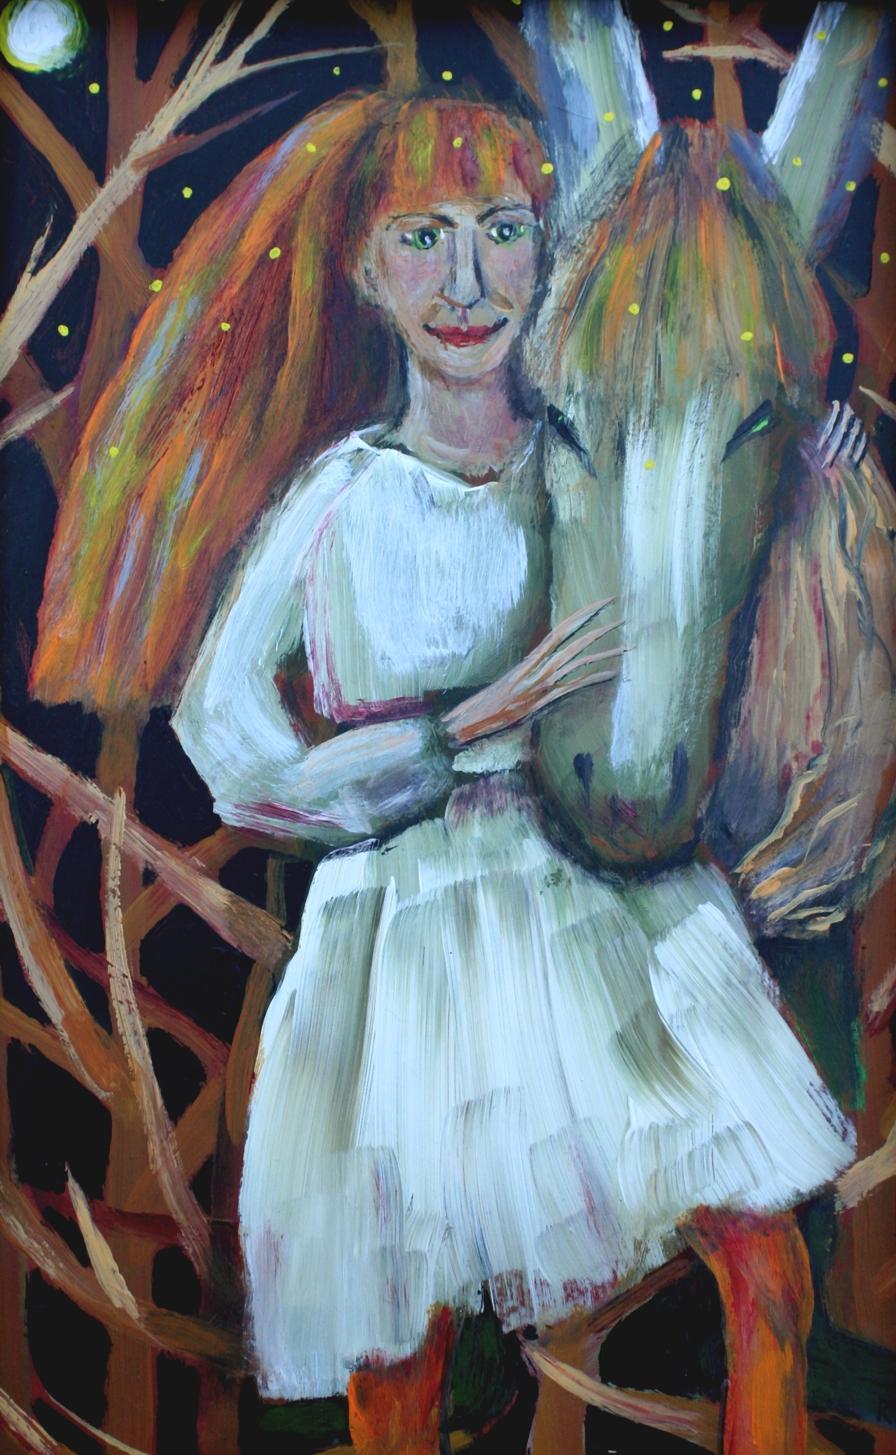 Titania & Bottom the weaver